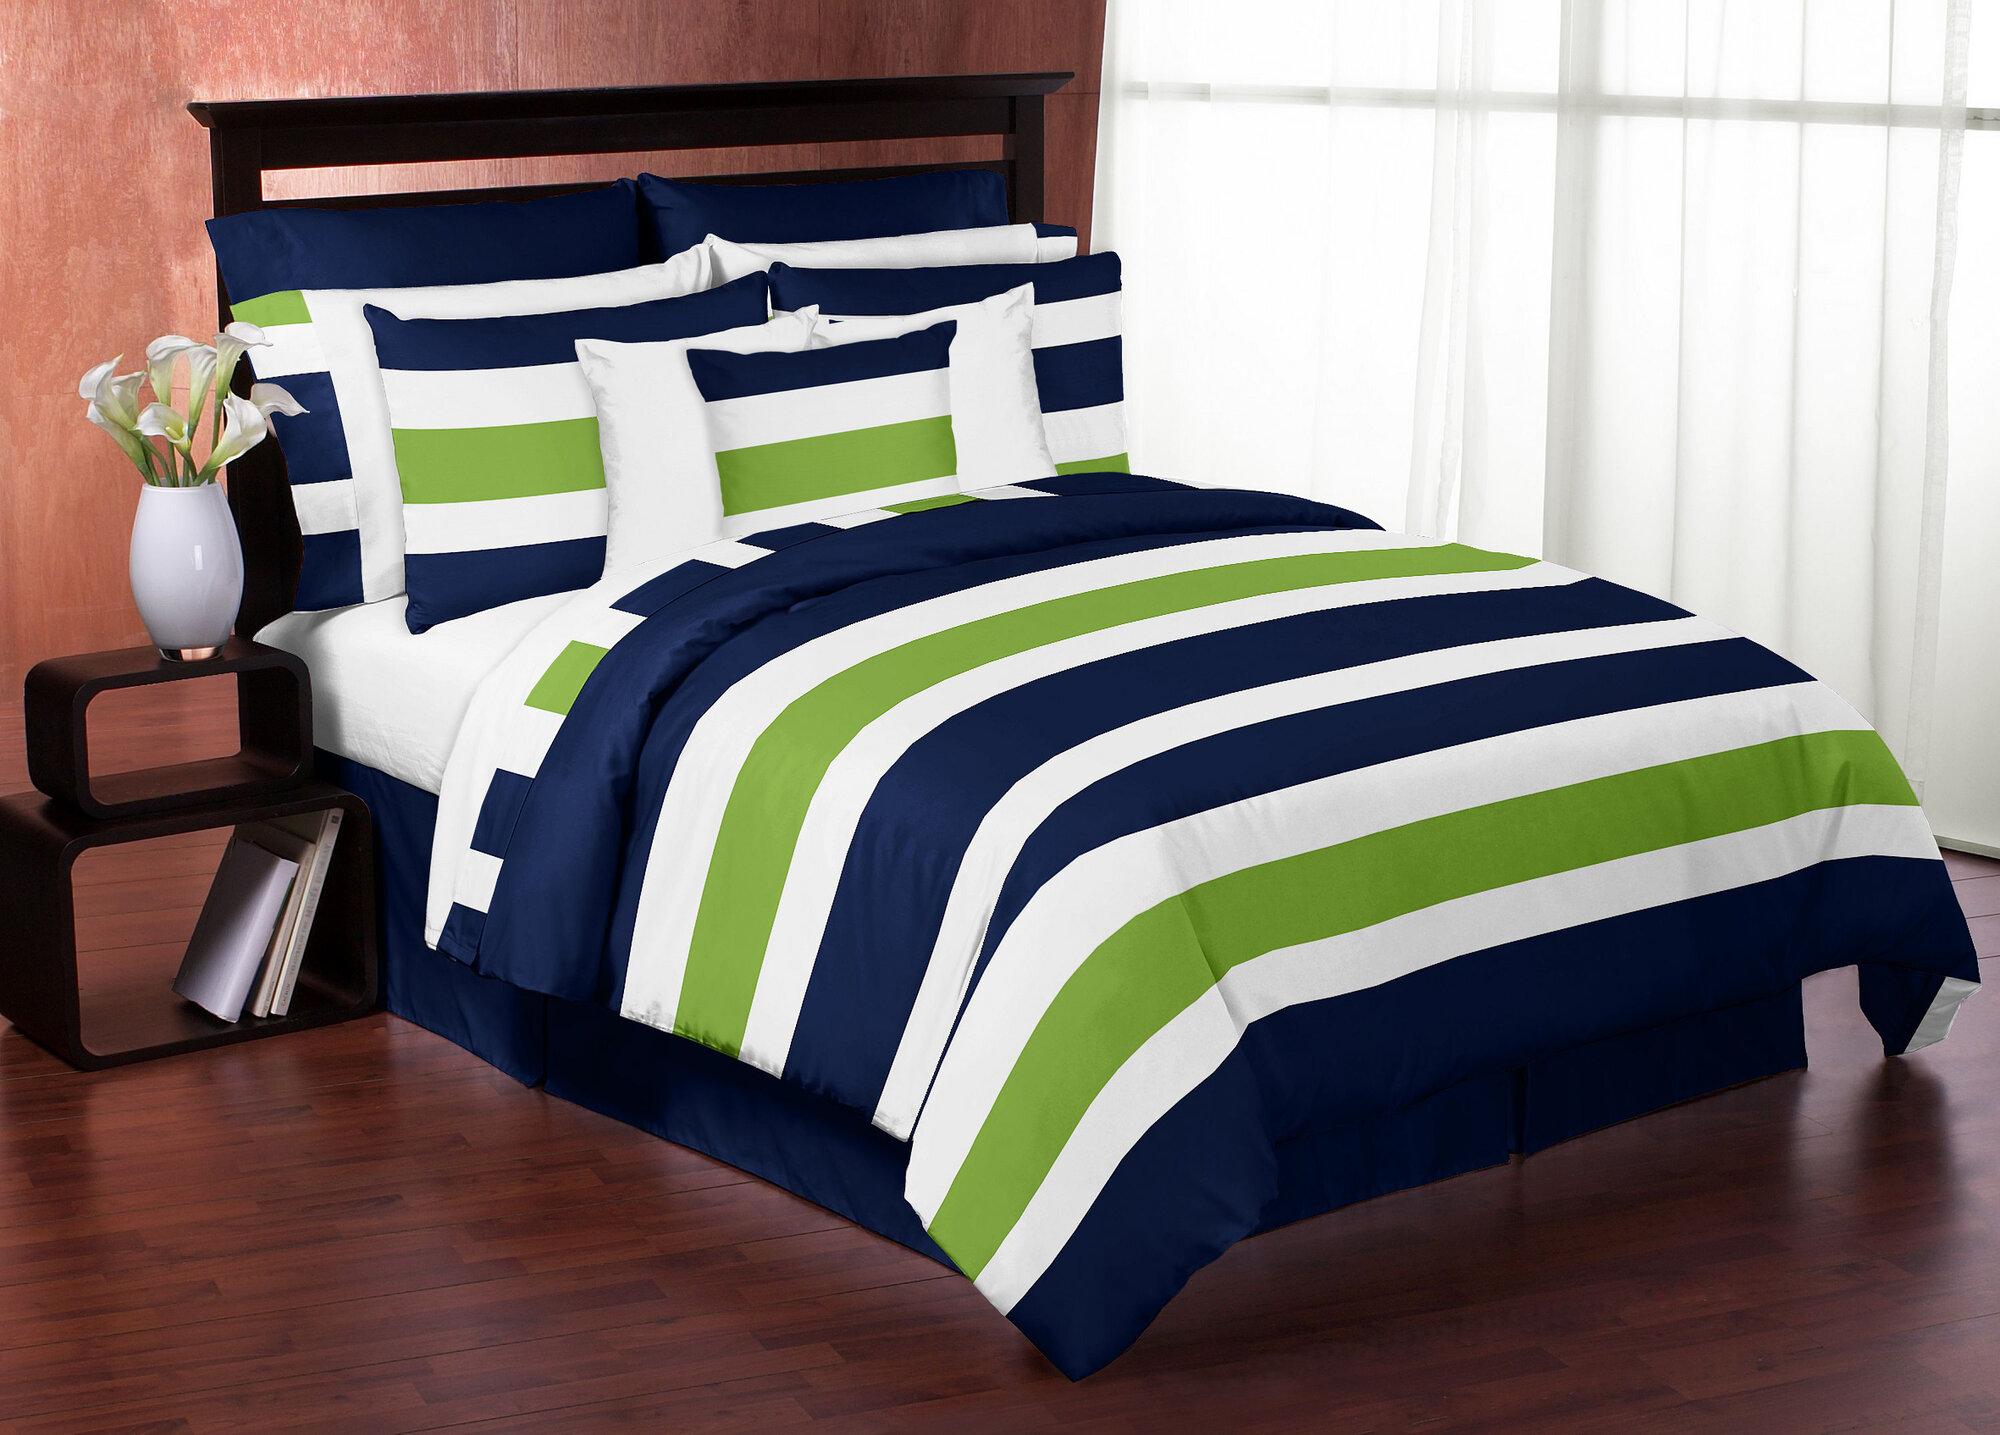 Modern Bedding Sets for Teen Boys